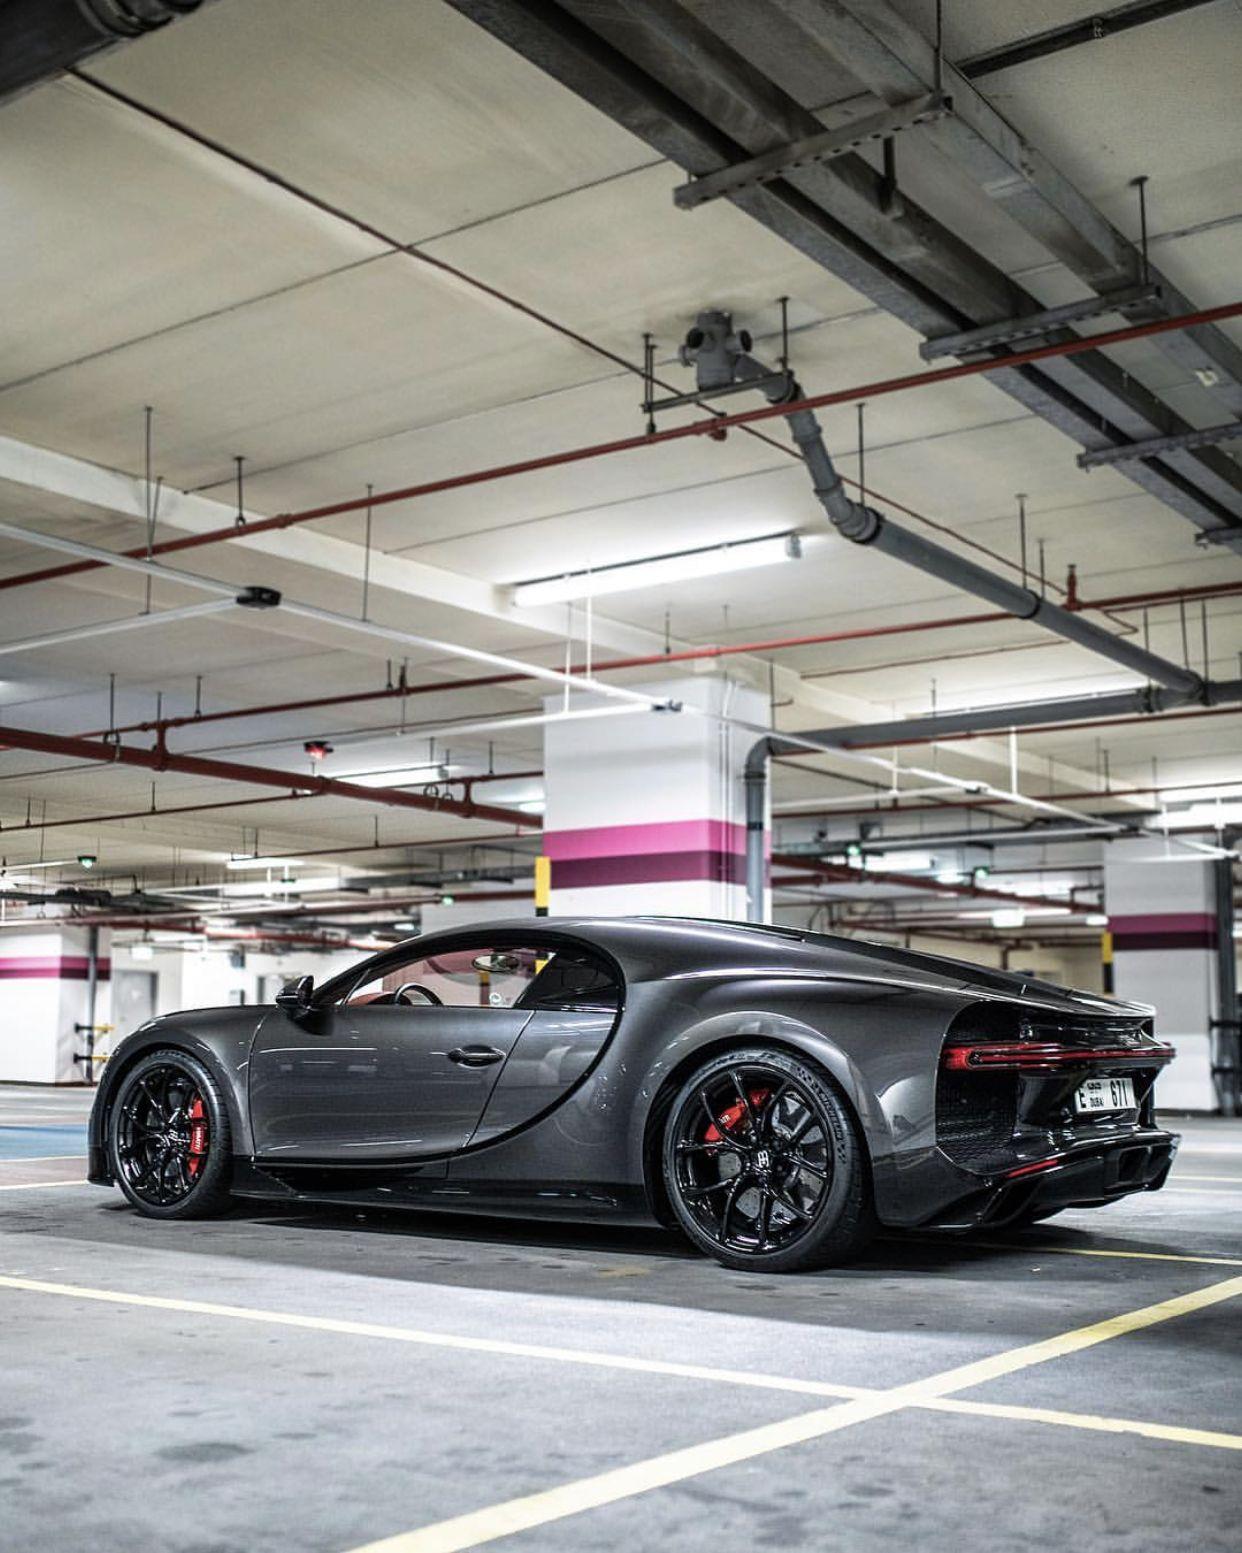 Bugatti Chiron Painted In Dark Gray W Black Accents Photo Taken